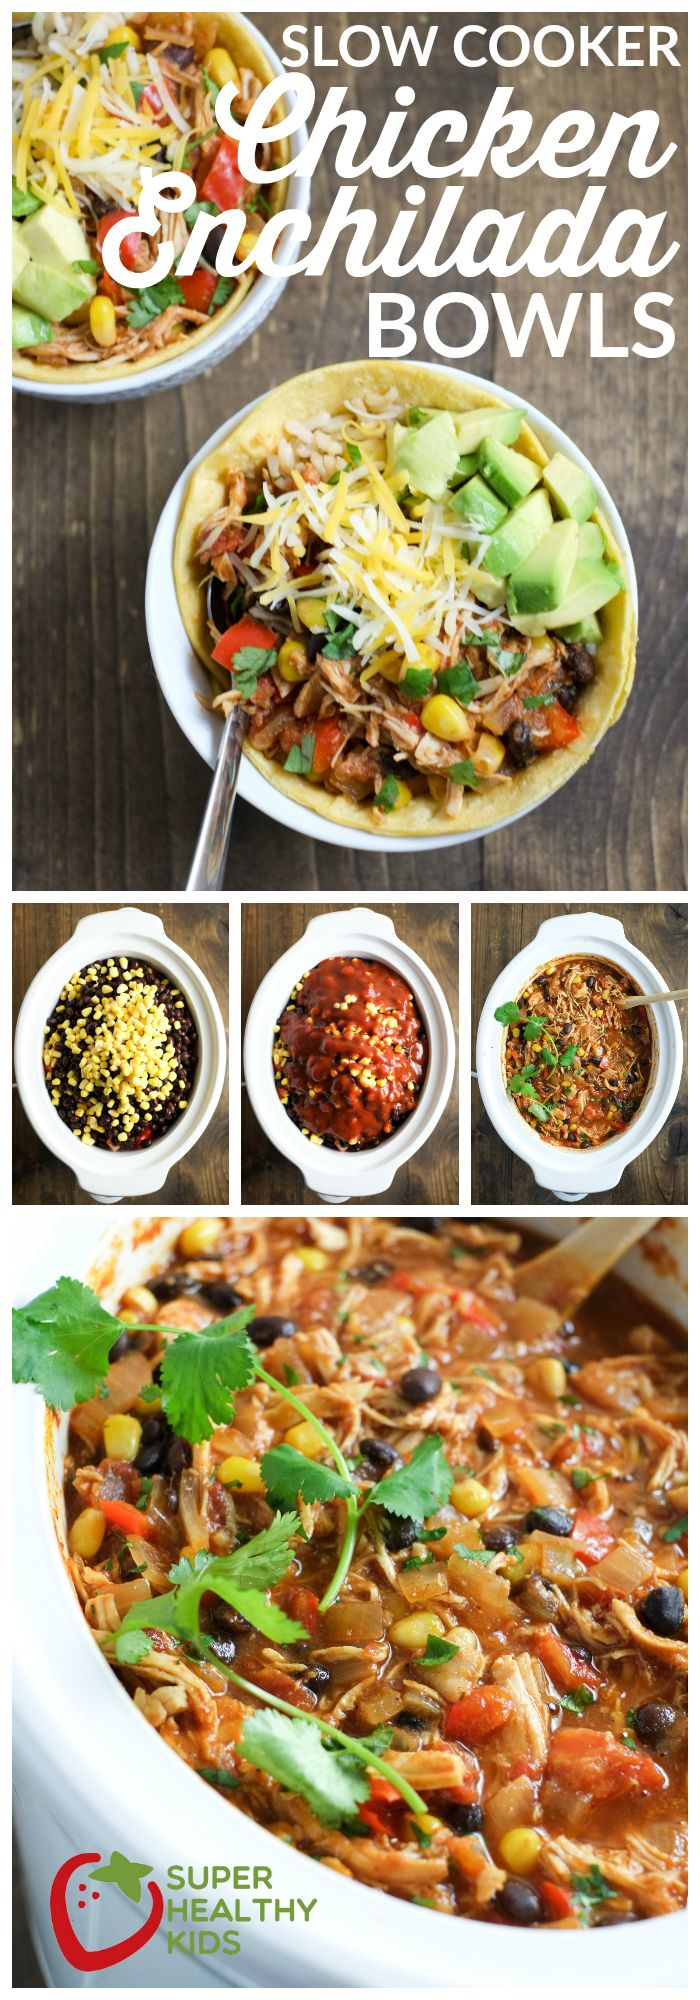 FOOD - Slow Cooker Chicken Enchilada Bowls | Super Healthy Kids | Food and Drink http://www.superhealthykids.com/slow-cooker-chic…ada-bowls-recipe/